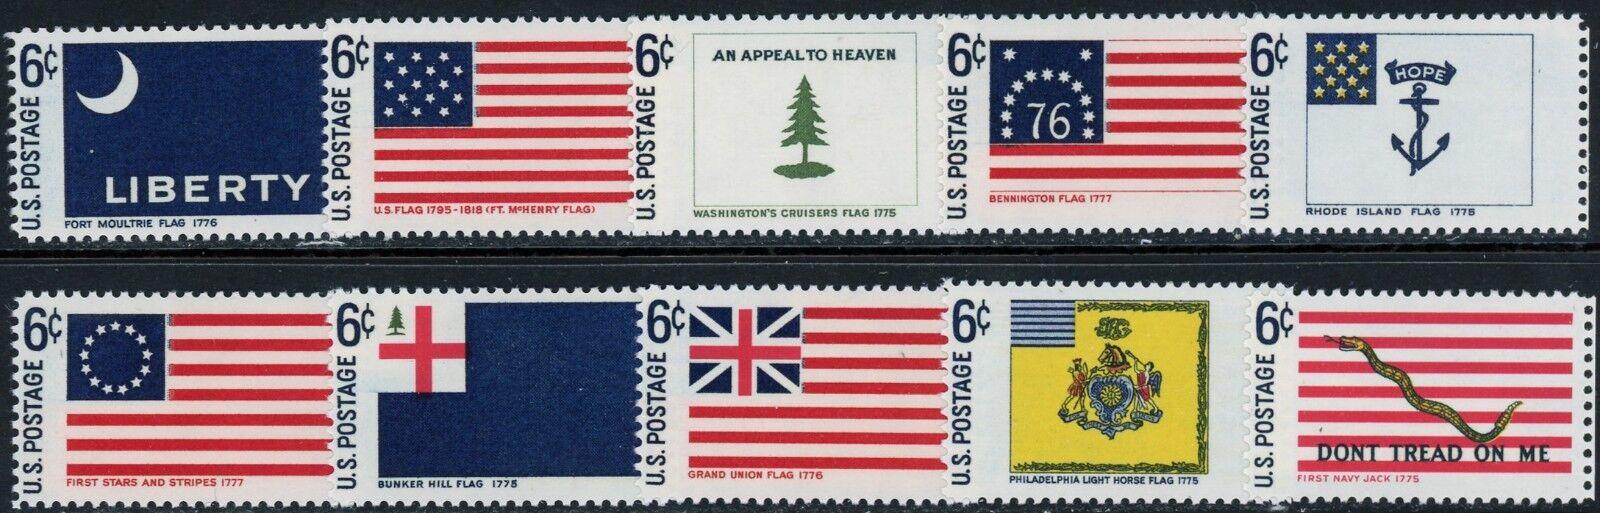 1968 6c Historic American Flags, Set of 10 Singles Scot